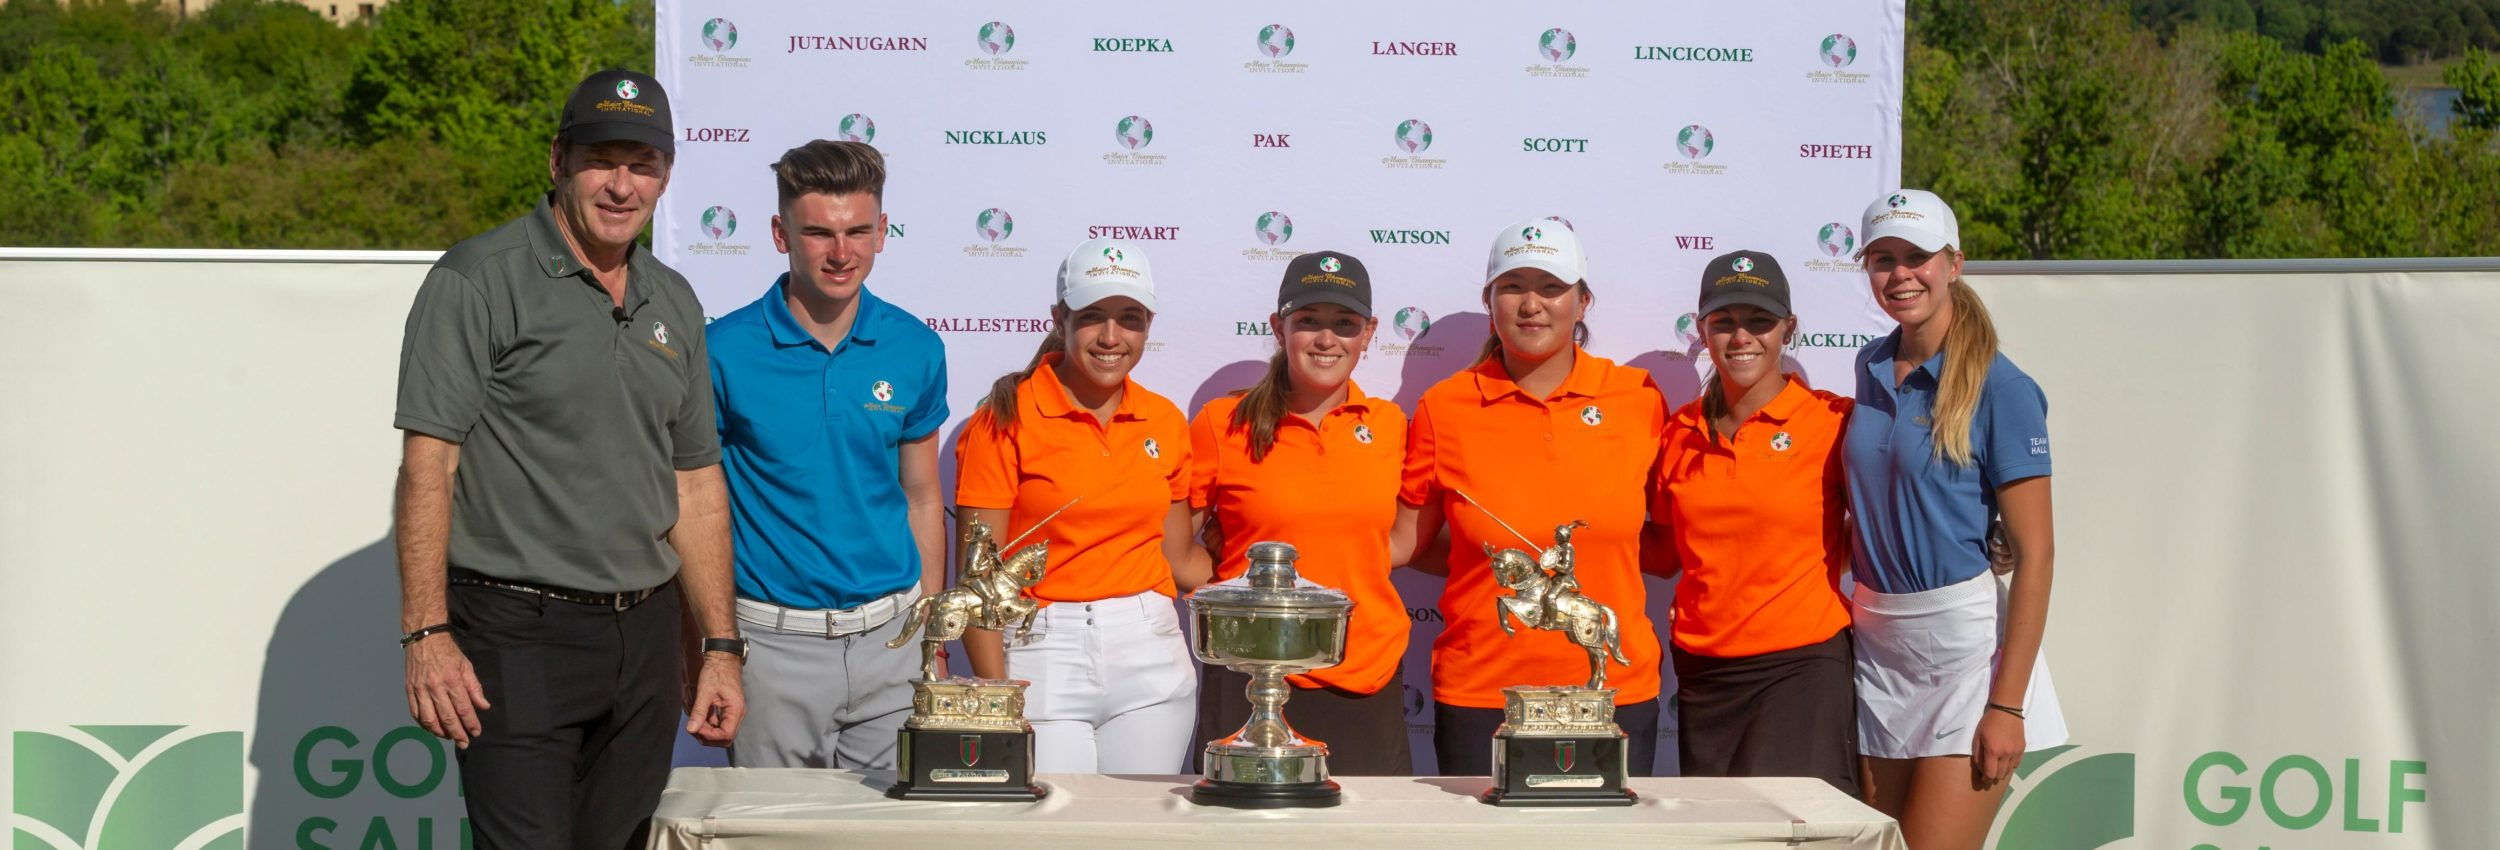 Championship hostscrop(From L-R) Sir Nick Faldo (Tournament Host), Conor Gough (2019 Boys), 2019 Team Winners, Annabell Fuller (2019 Girls)